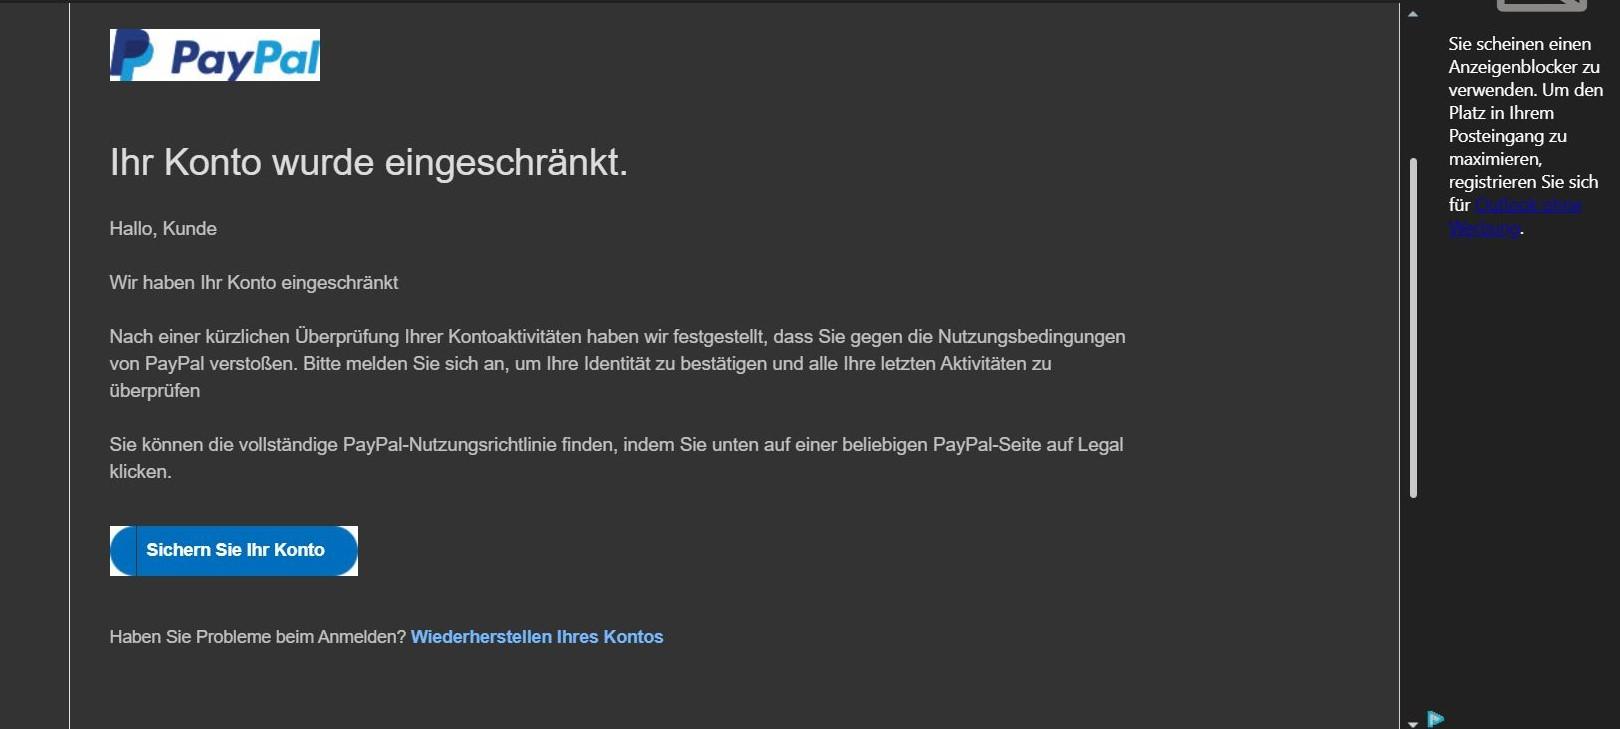 PayPal_1__2_.jpg